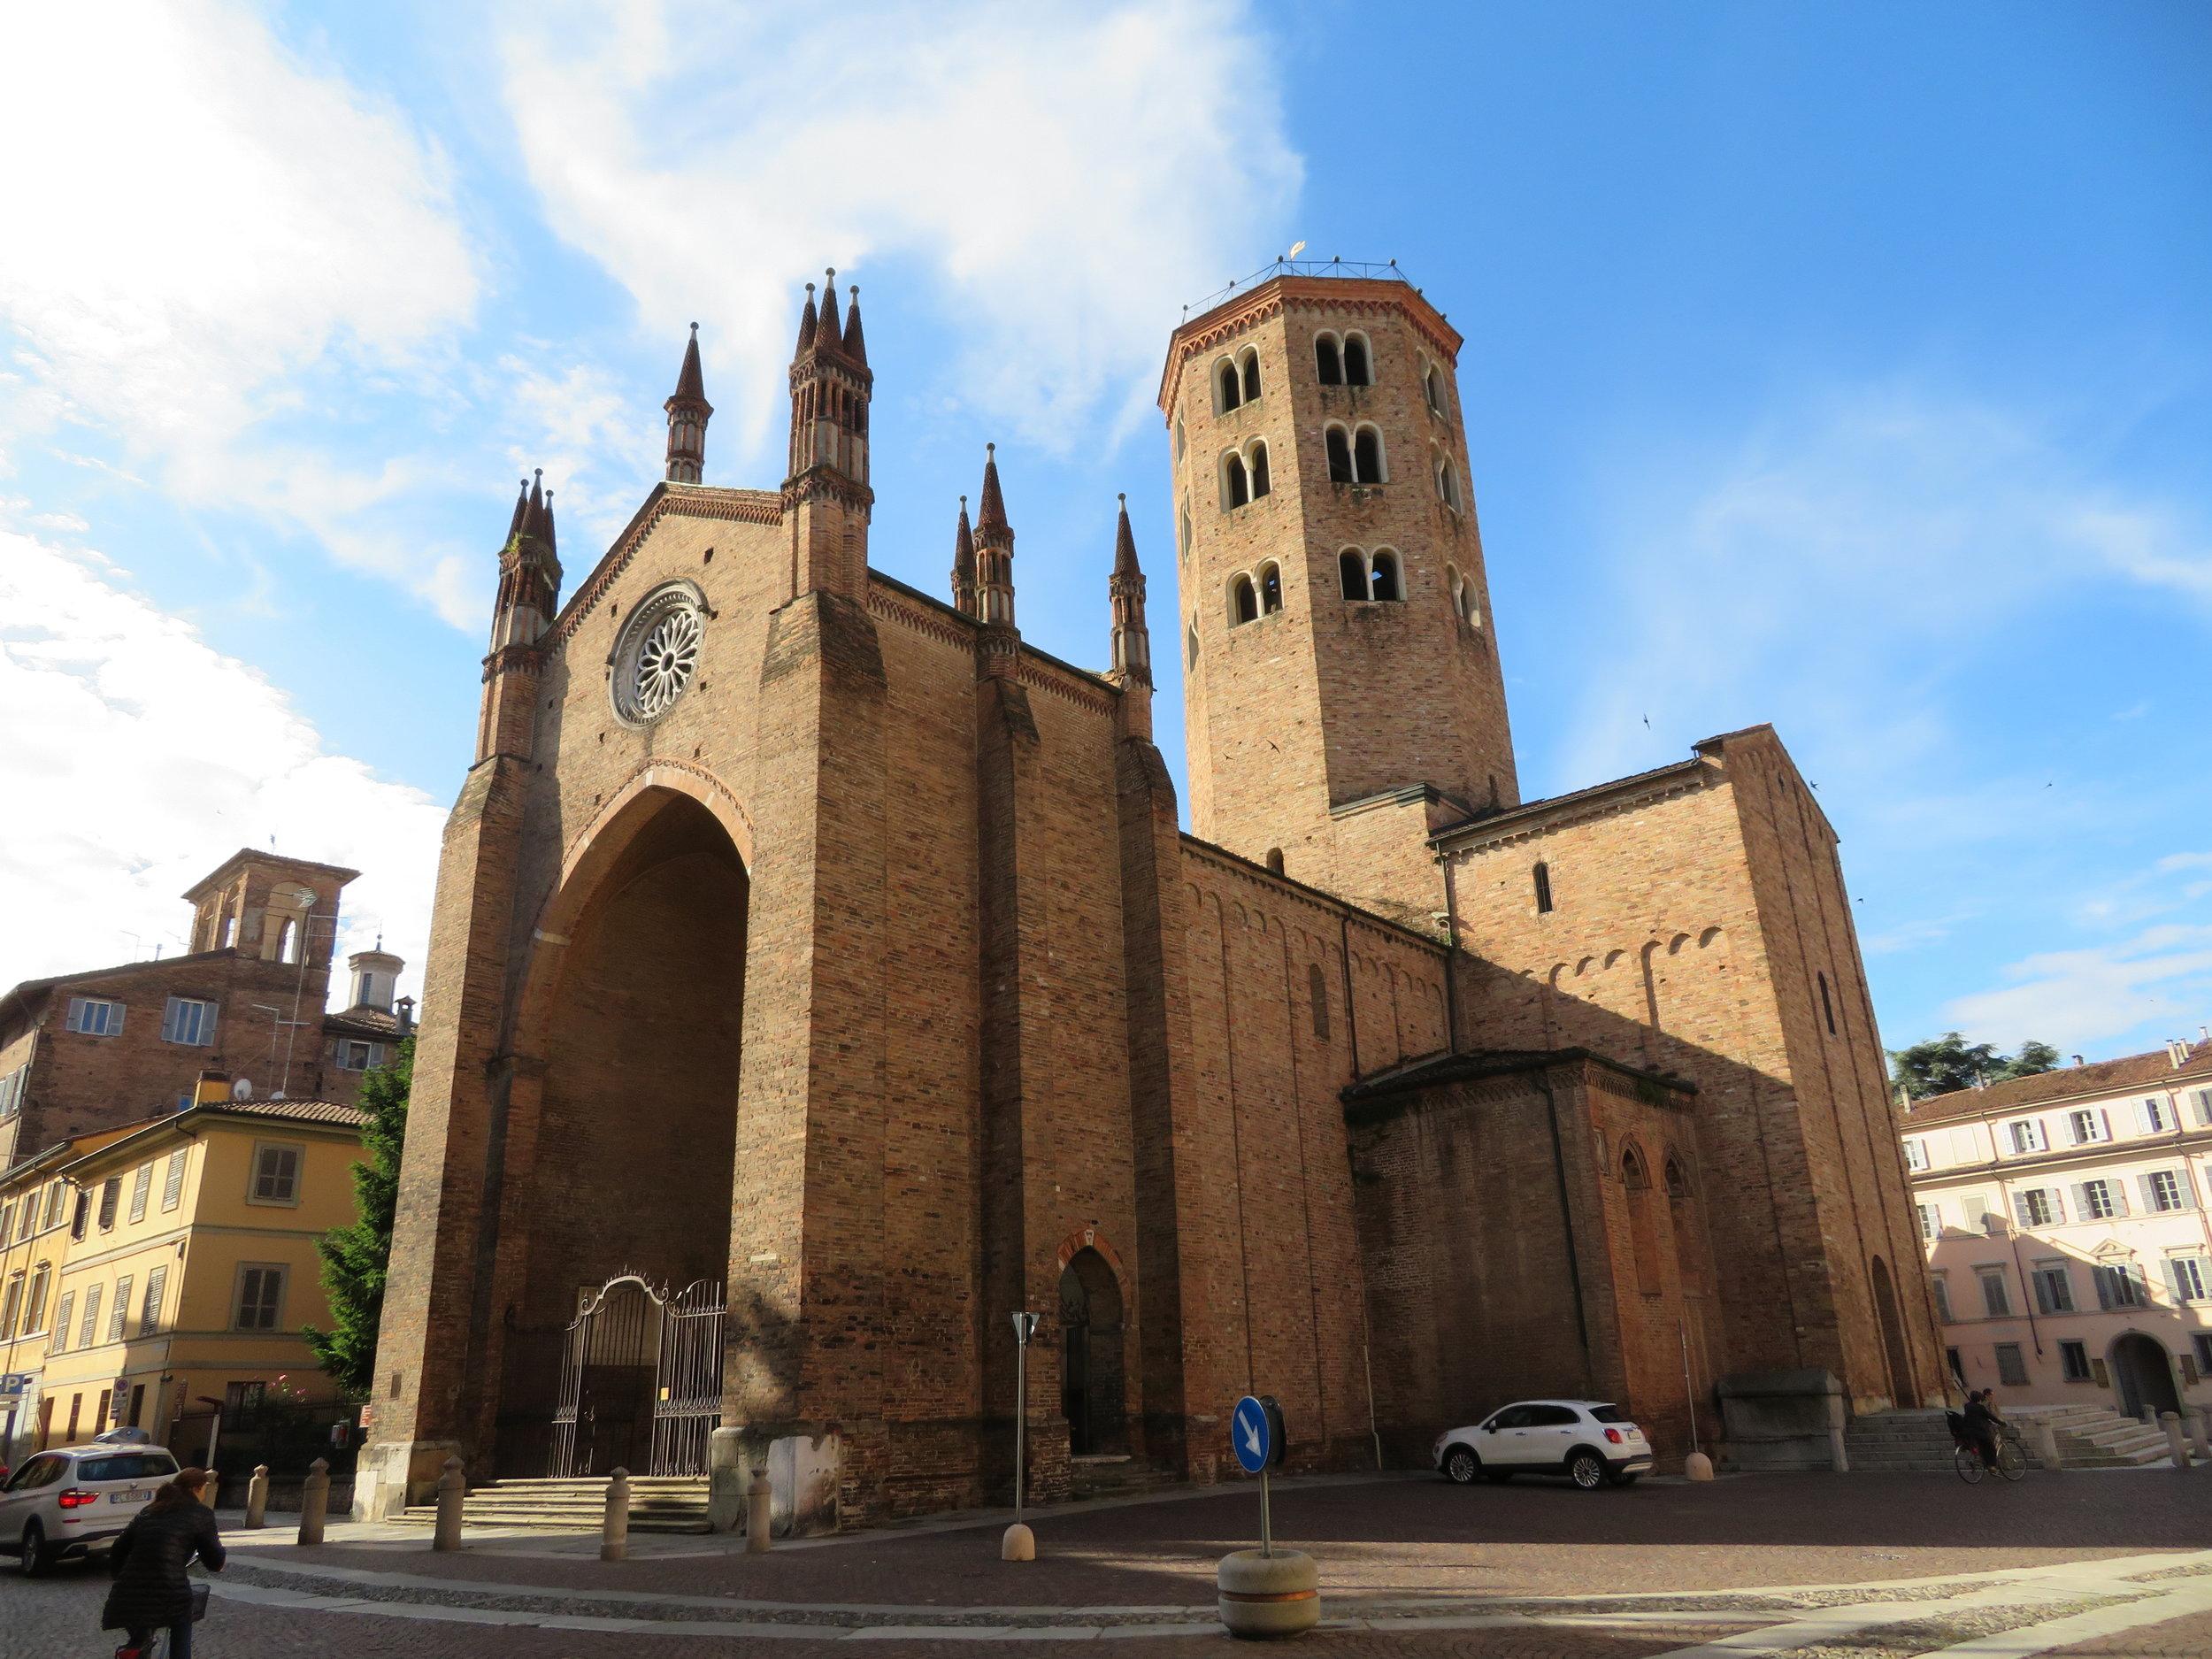 We also visited the Basilica of Sant'Antonio built c.1350.